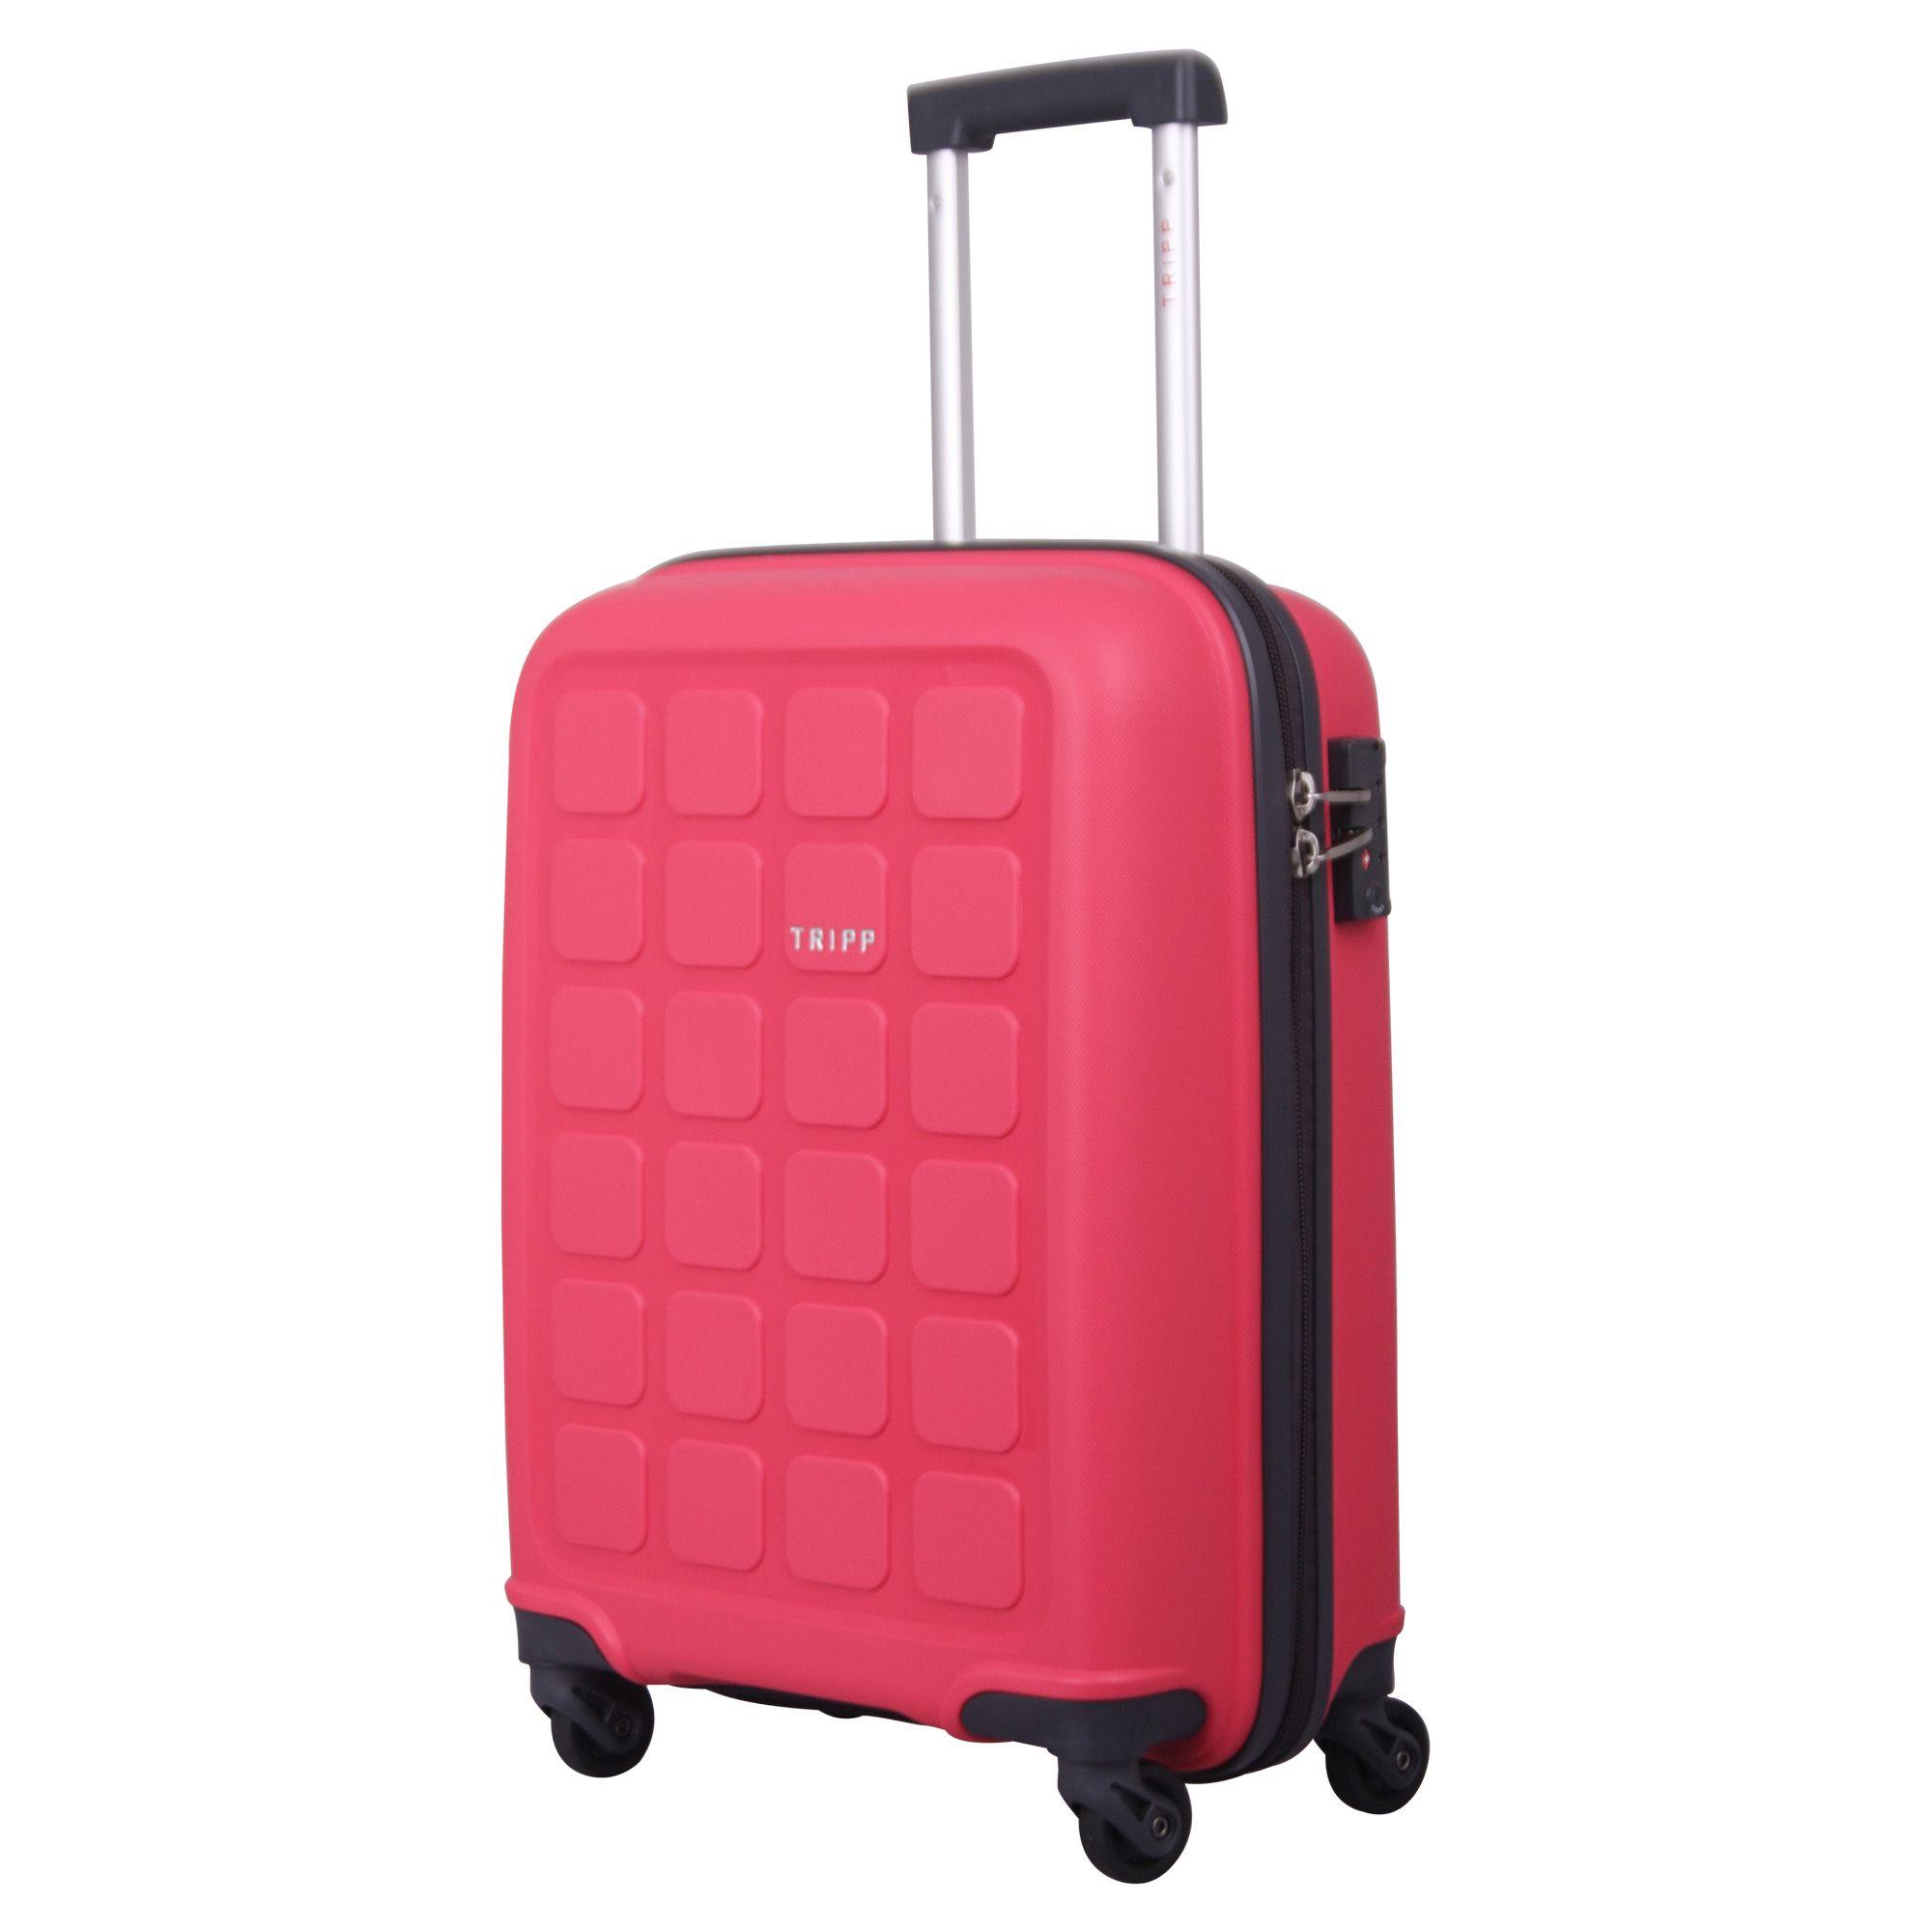 Tripp Raspberry 'Holiday 6' Cabin 4 Wheel Suitcase - Hard ...